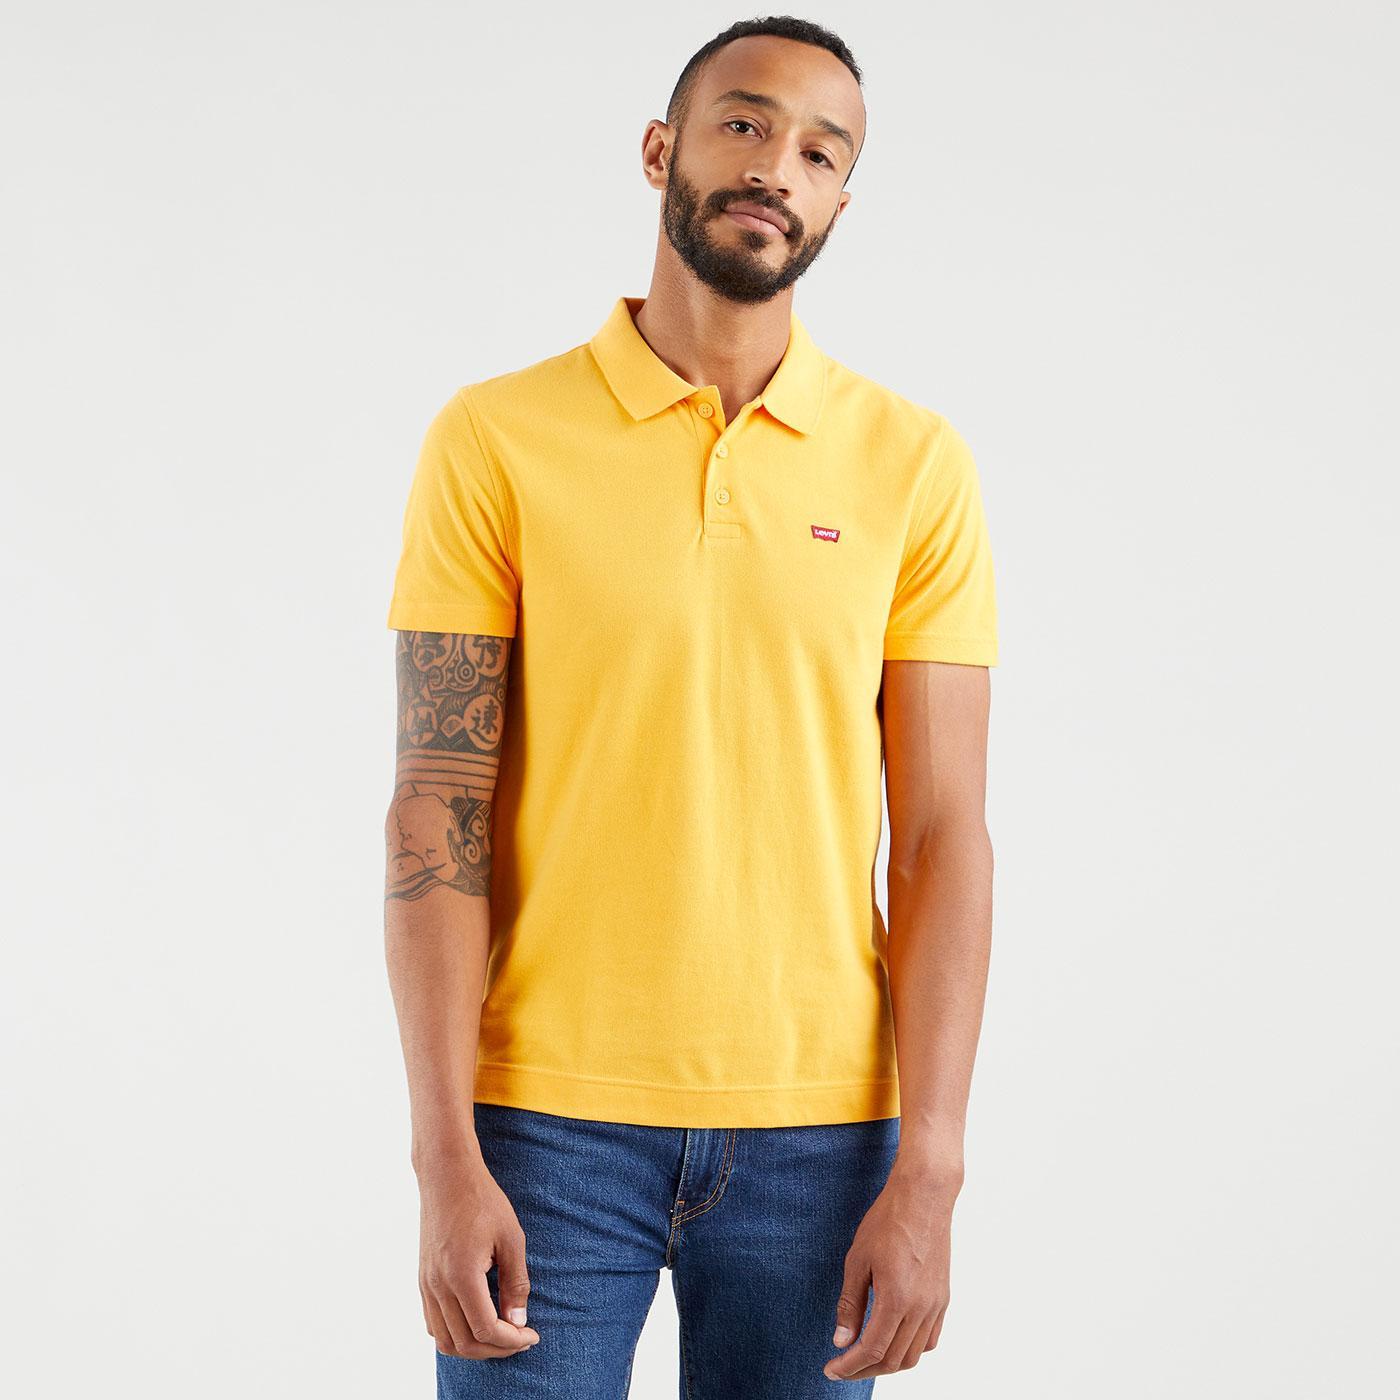 LEVI'S O.G. Batwing Mod Polo Shirt (Kumquat)